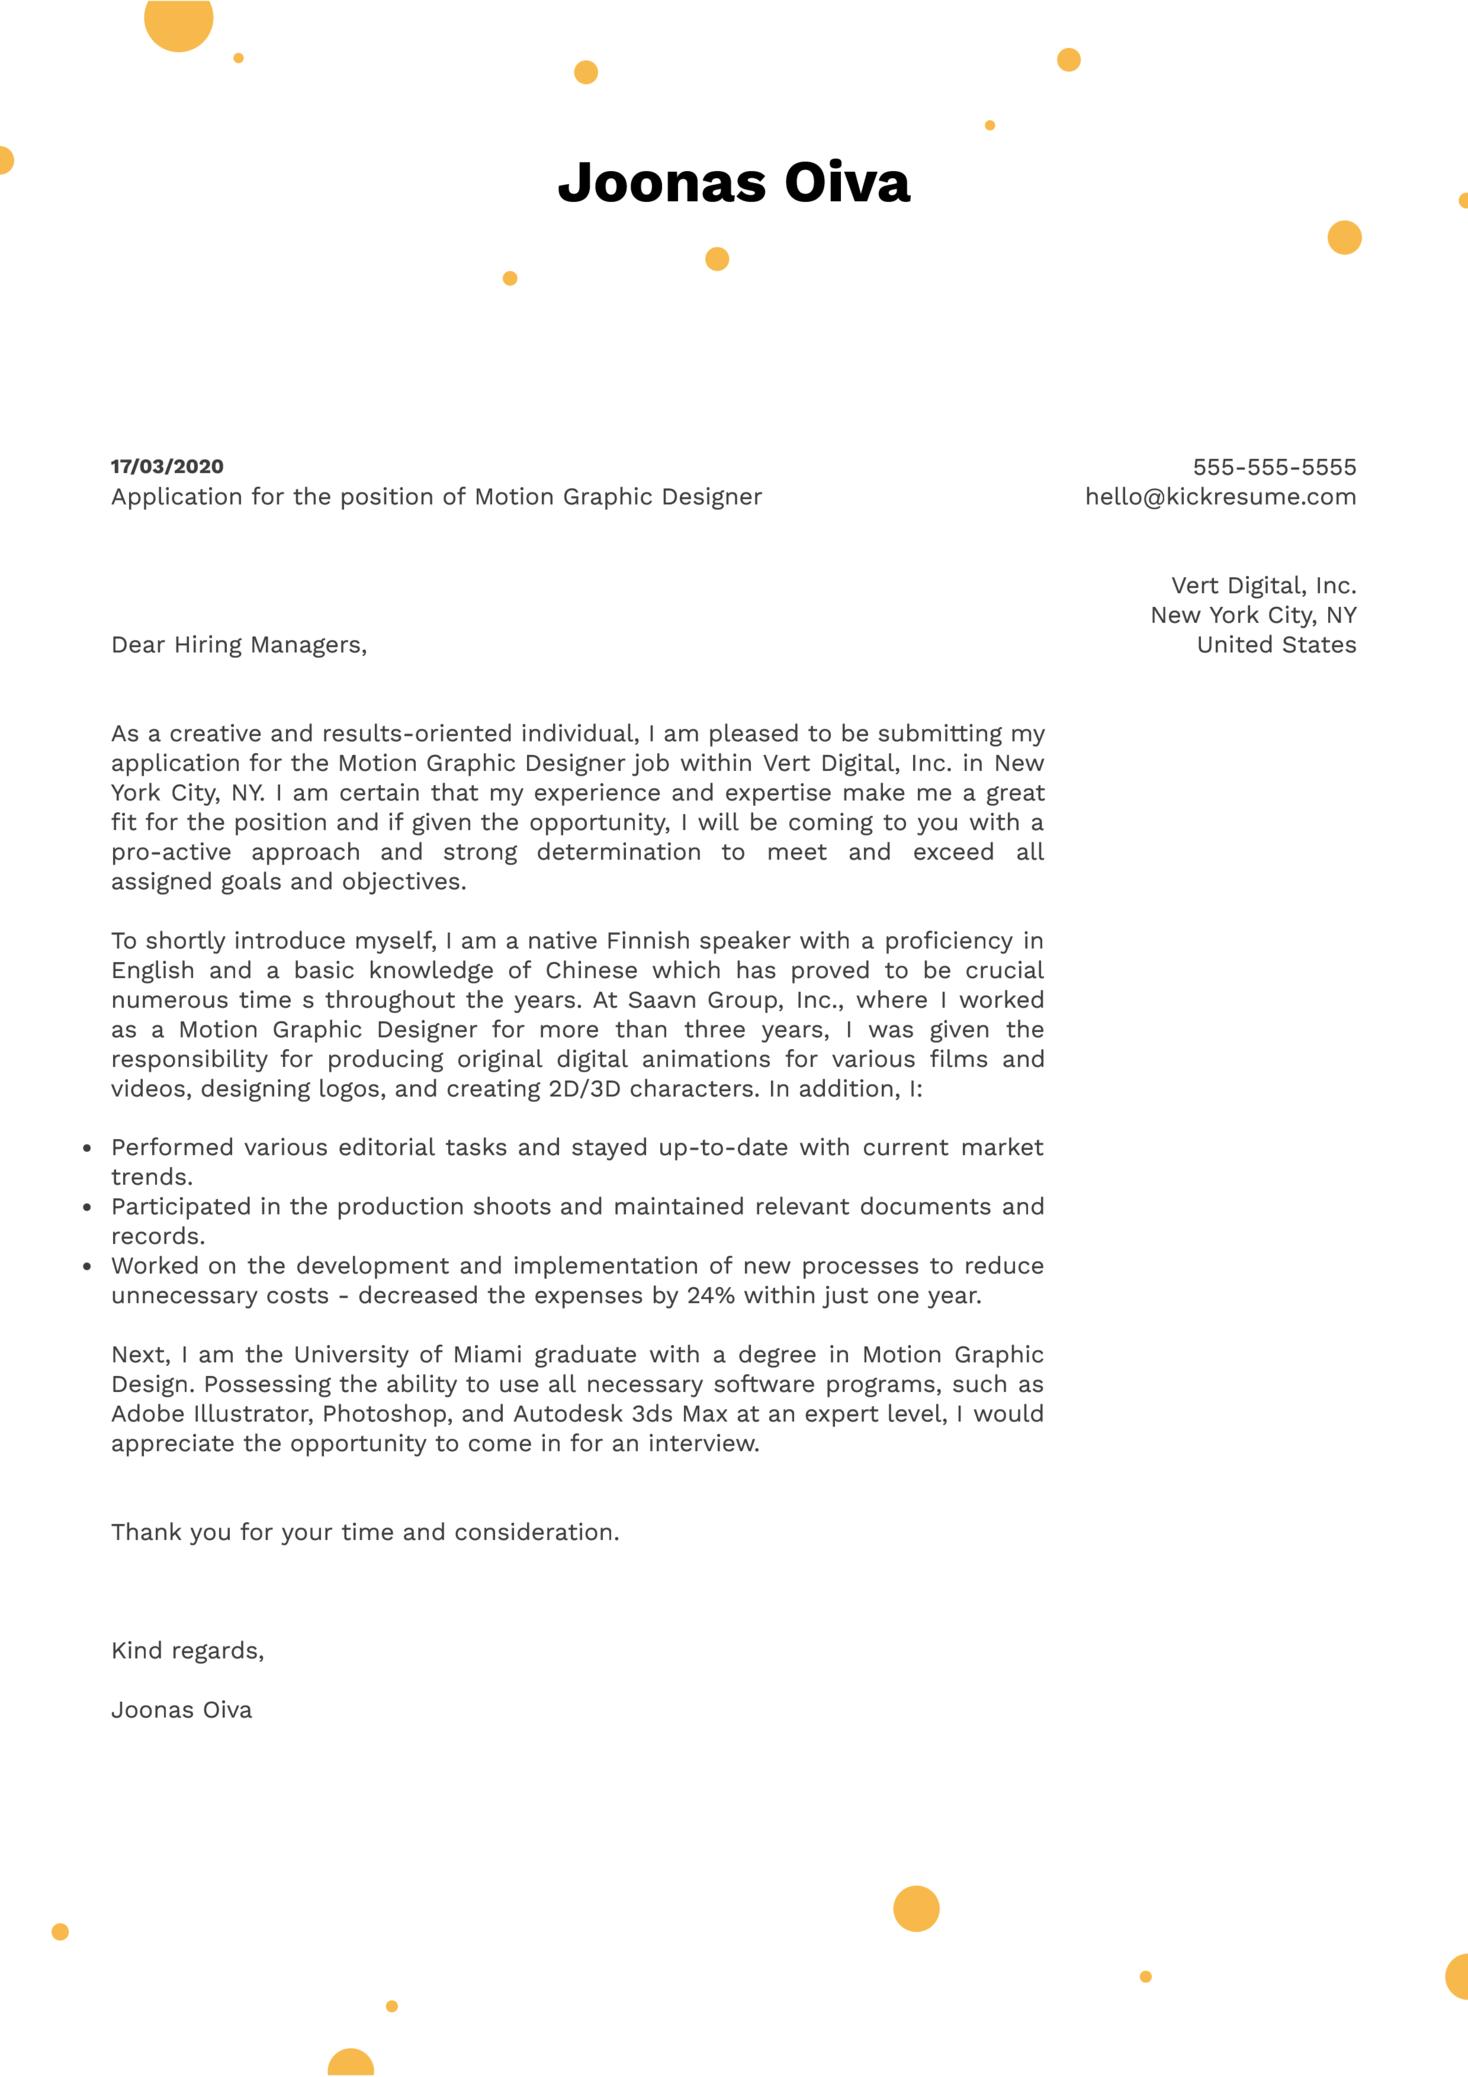 Motion Graphic Designer Cover Letter Template